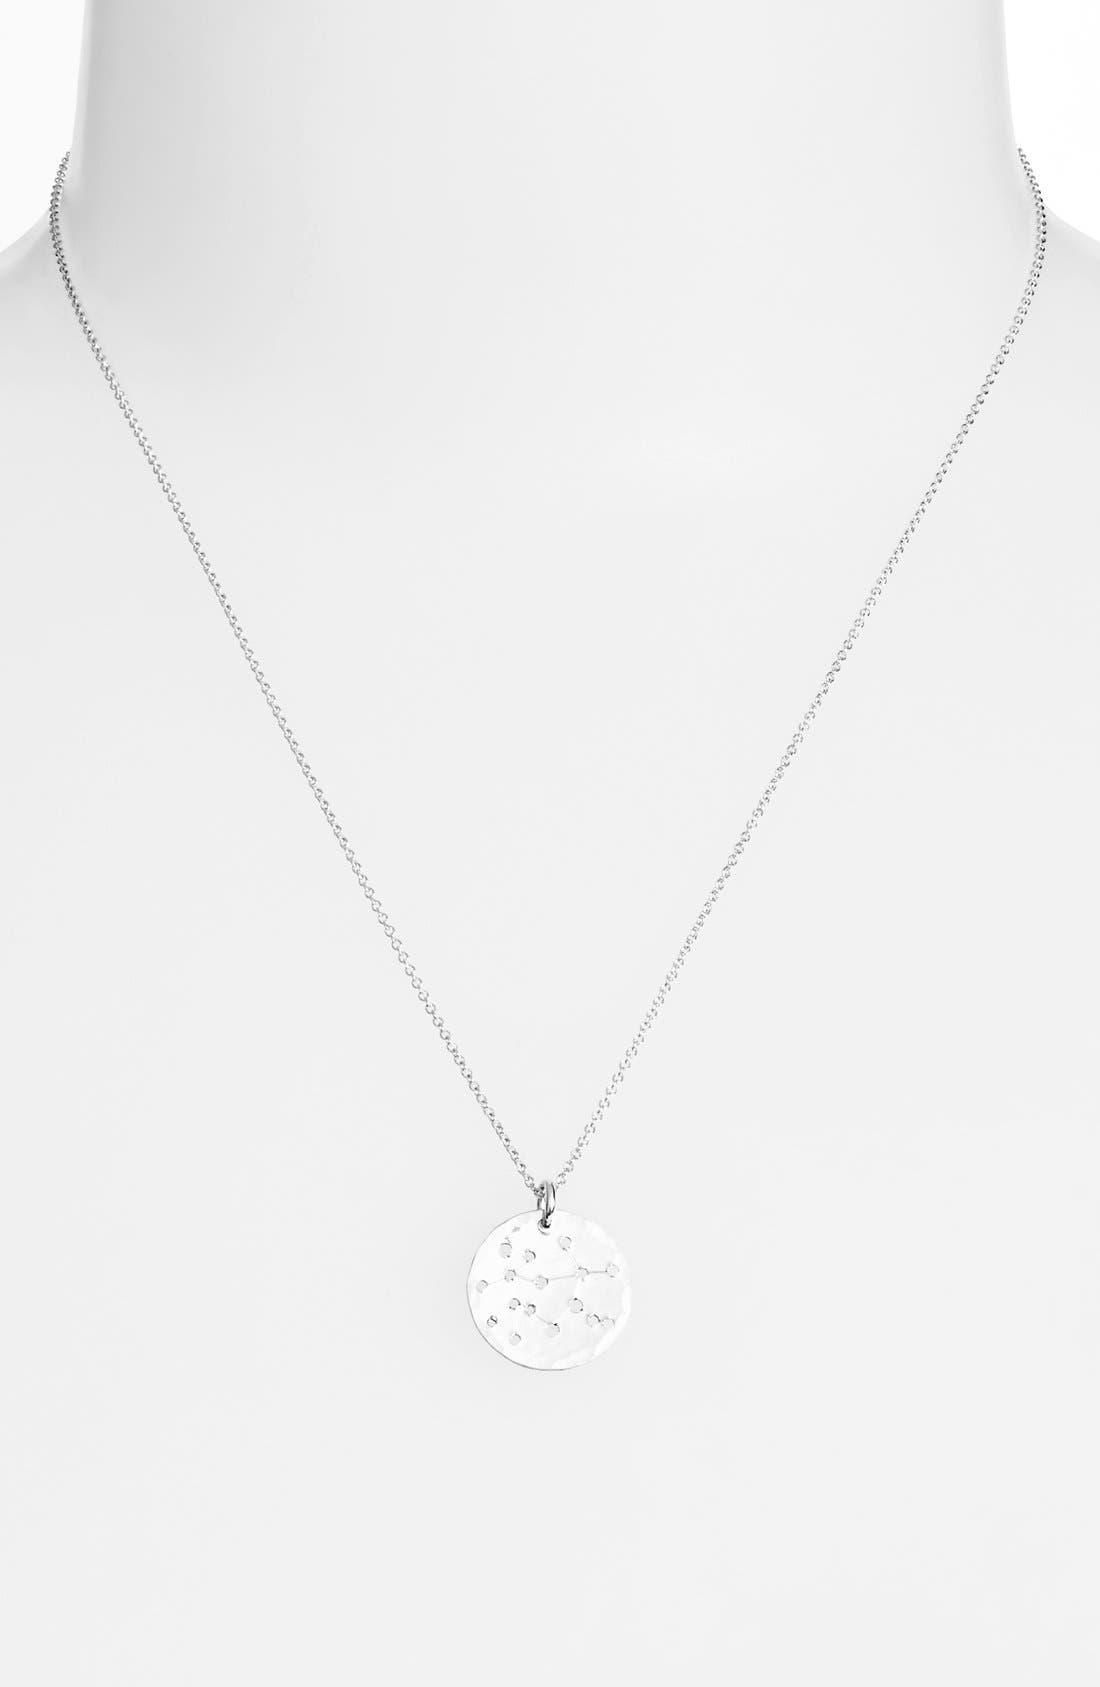 Ija 'Small Zodiac' Sterling Silver Necklace,                             Main thumbnail 3, color,